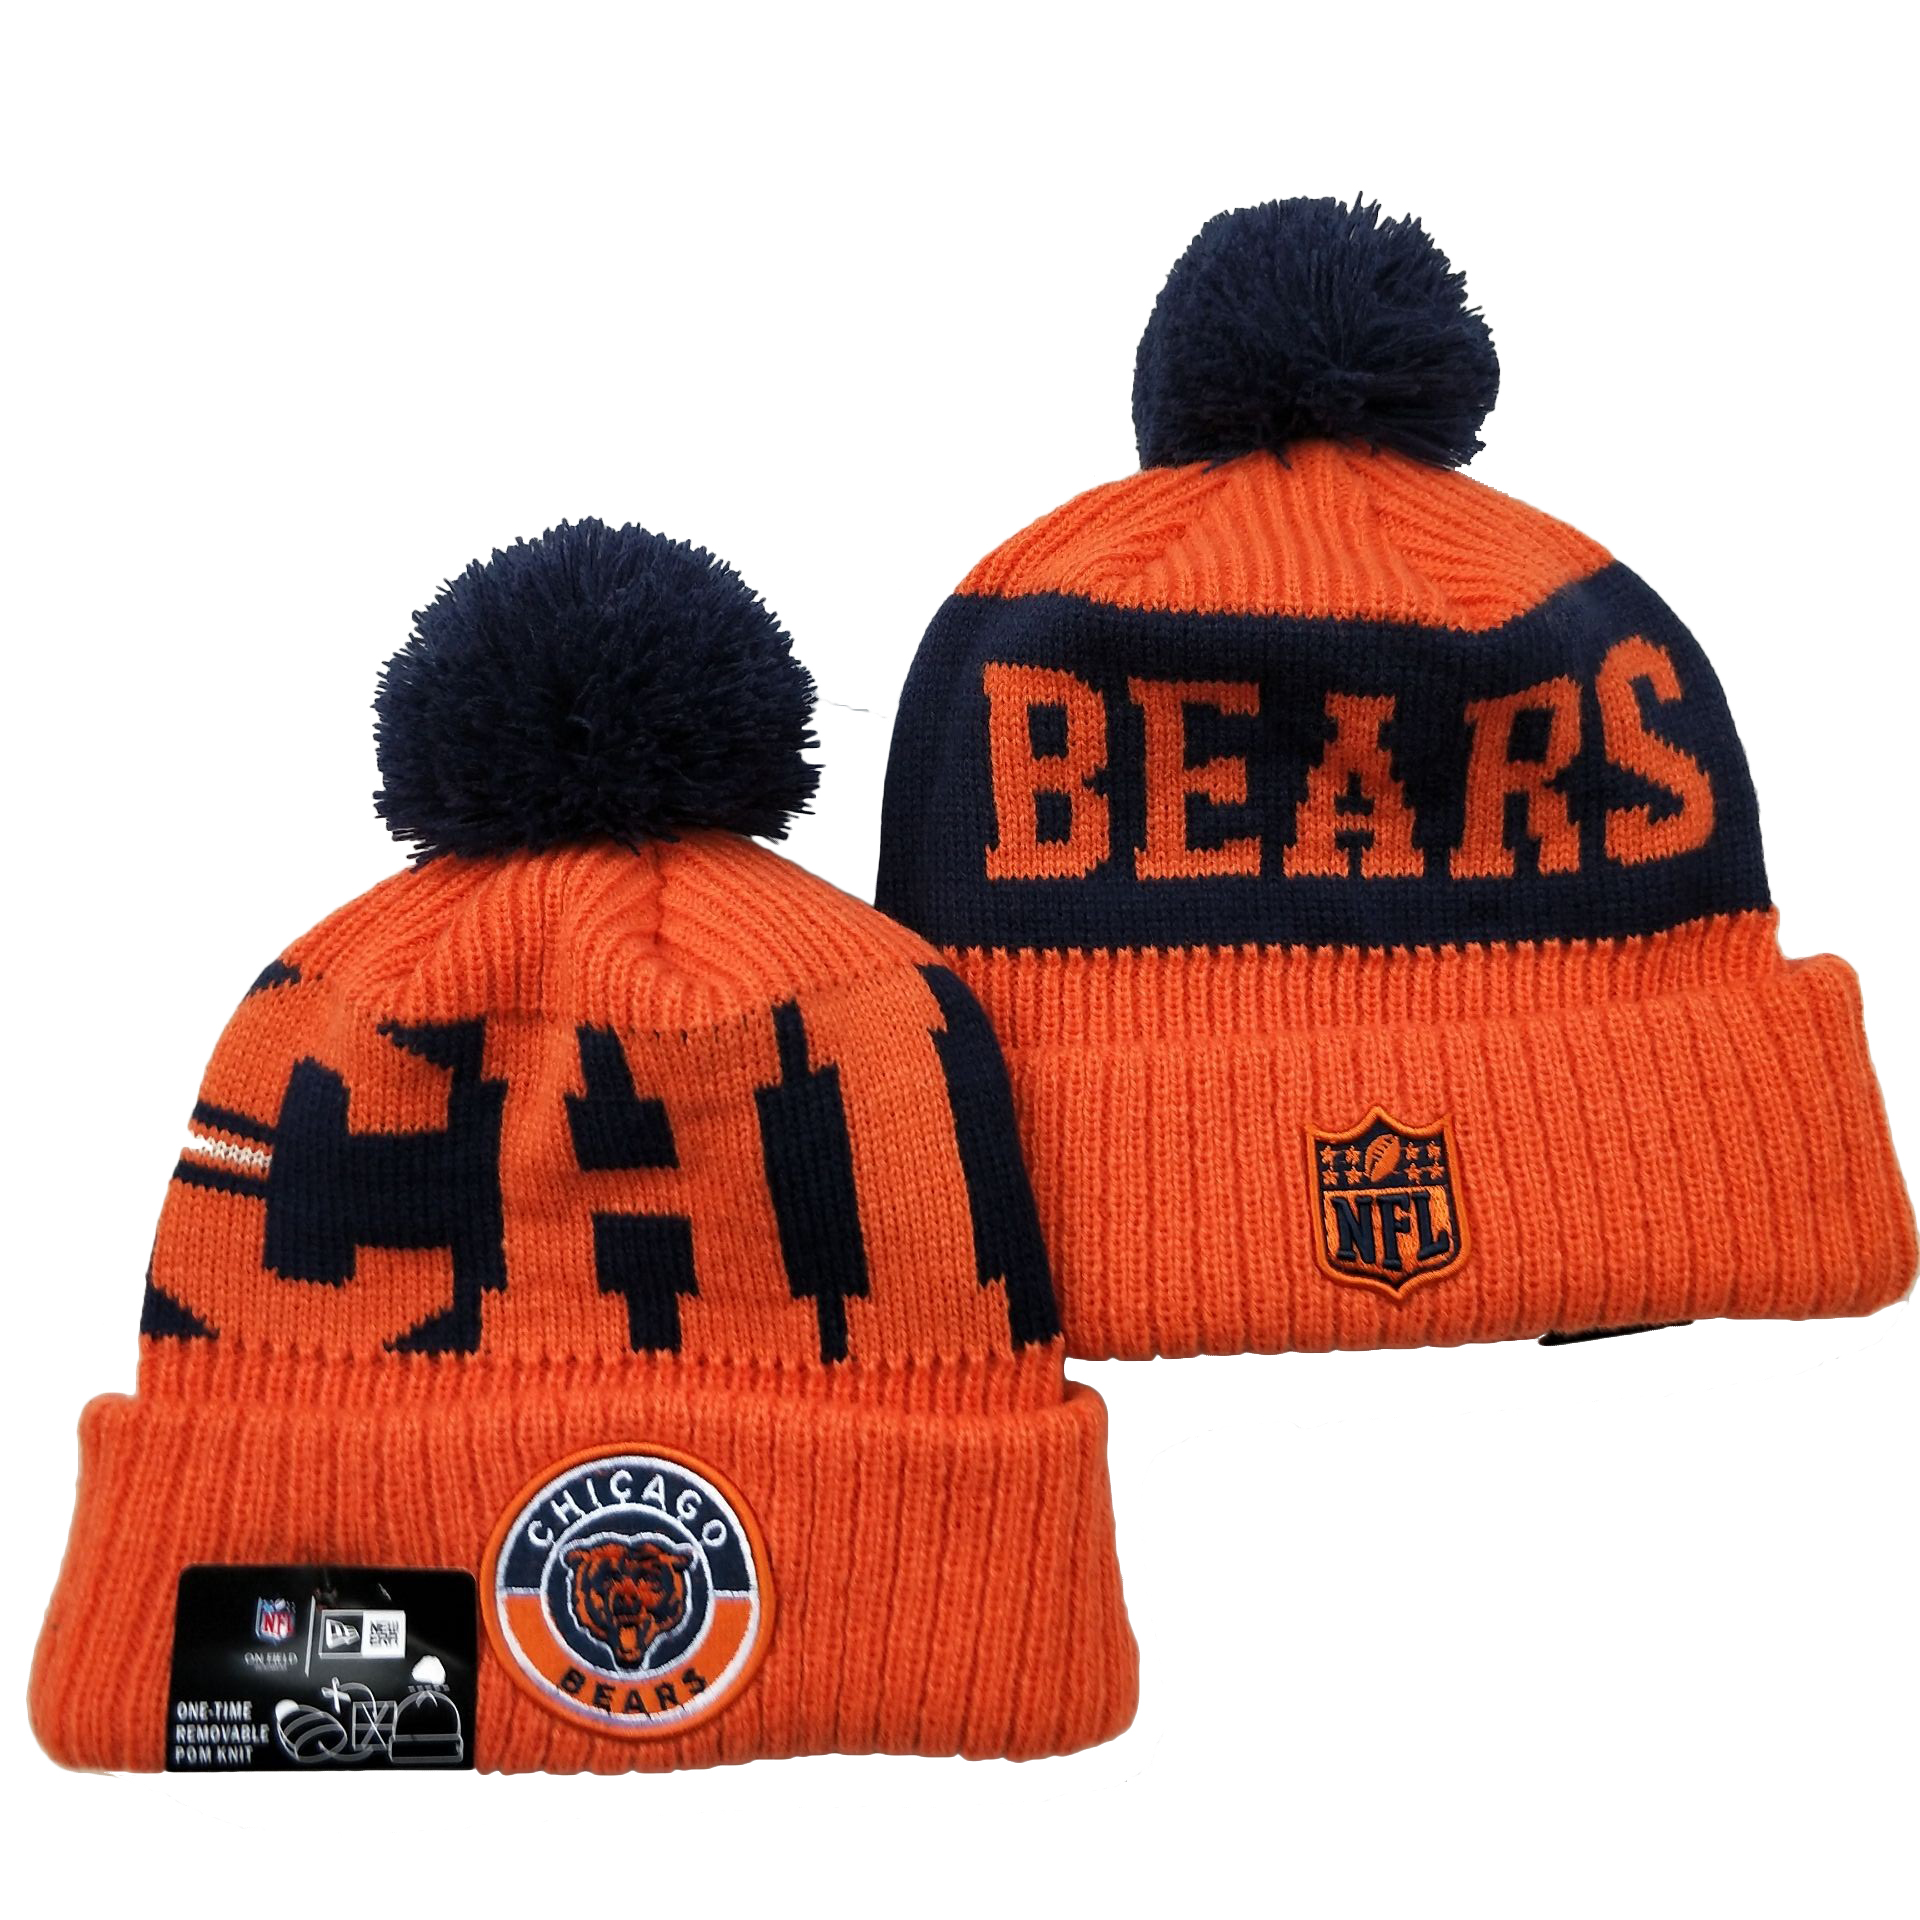 Bears Team Logo Orange 2020 NFL Sideline Pom Cuffed Knit Hat YD